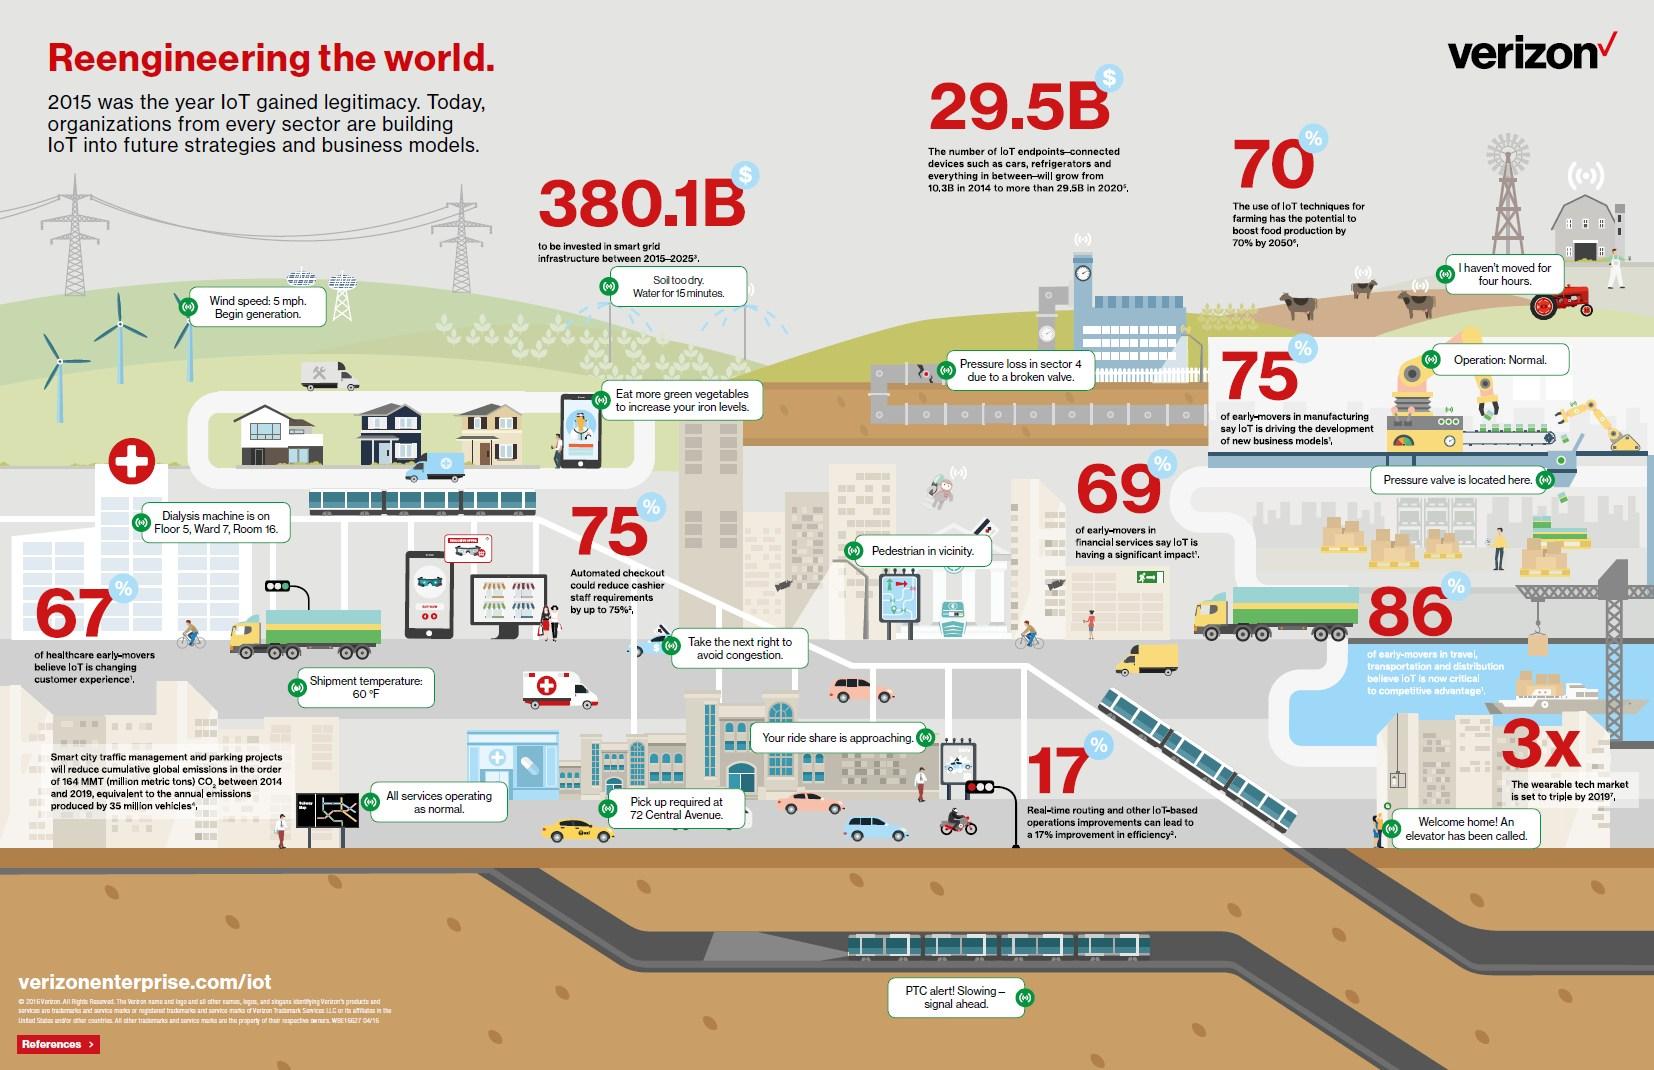 infografik verizon iot reengineering